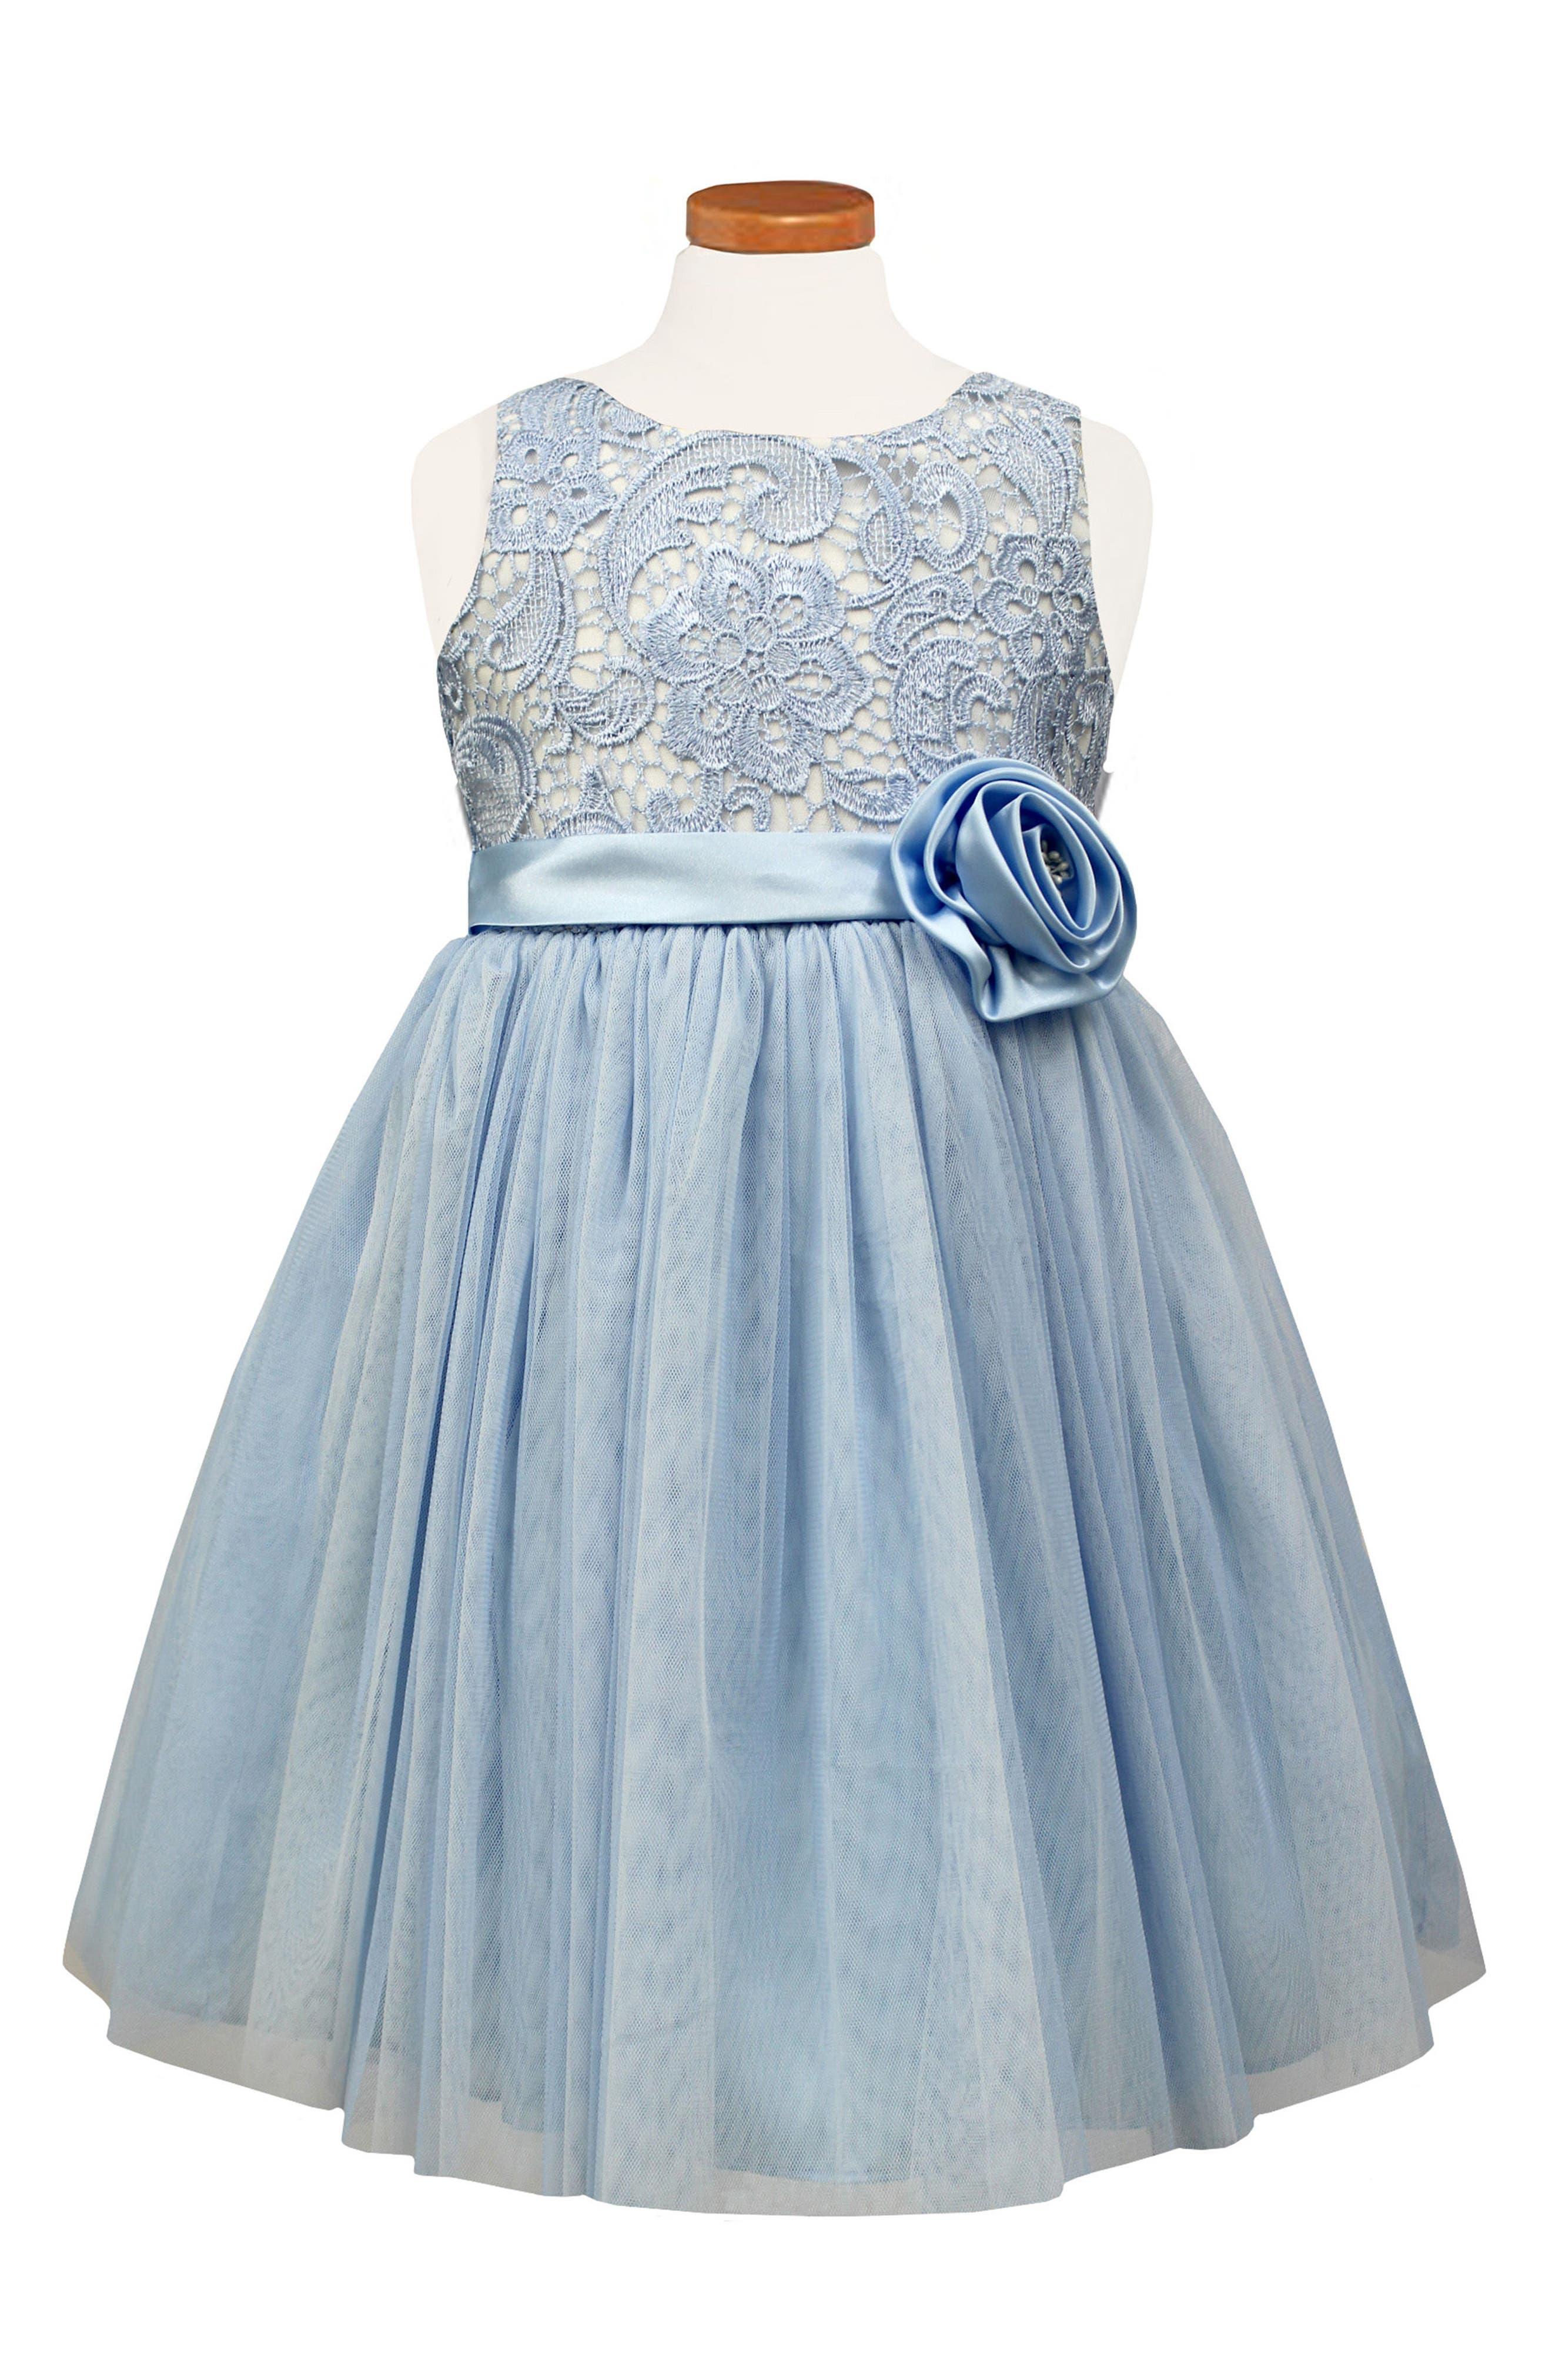 Sorbet Floral Lace Ballerina Dress (Toddler Girls & Little Girls)